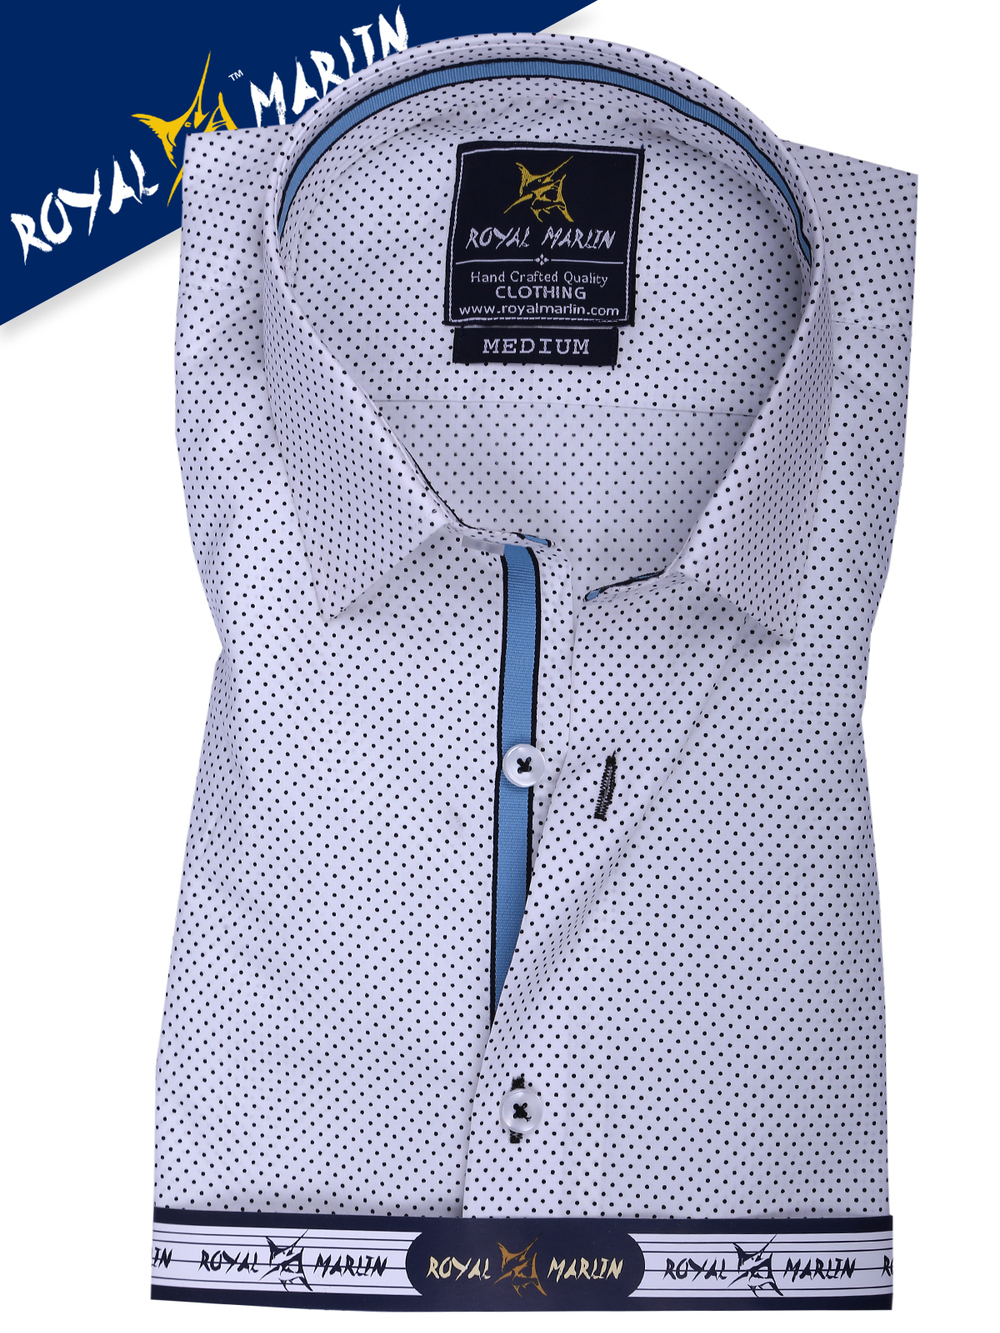 Shirt design blue cotton - Men S Shirts Cotton Shirt Blue Shirt Soft Fabric Shirt Export Quality Shirt